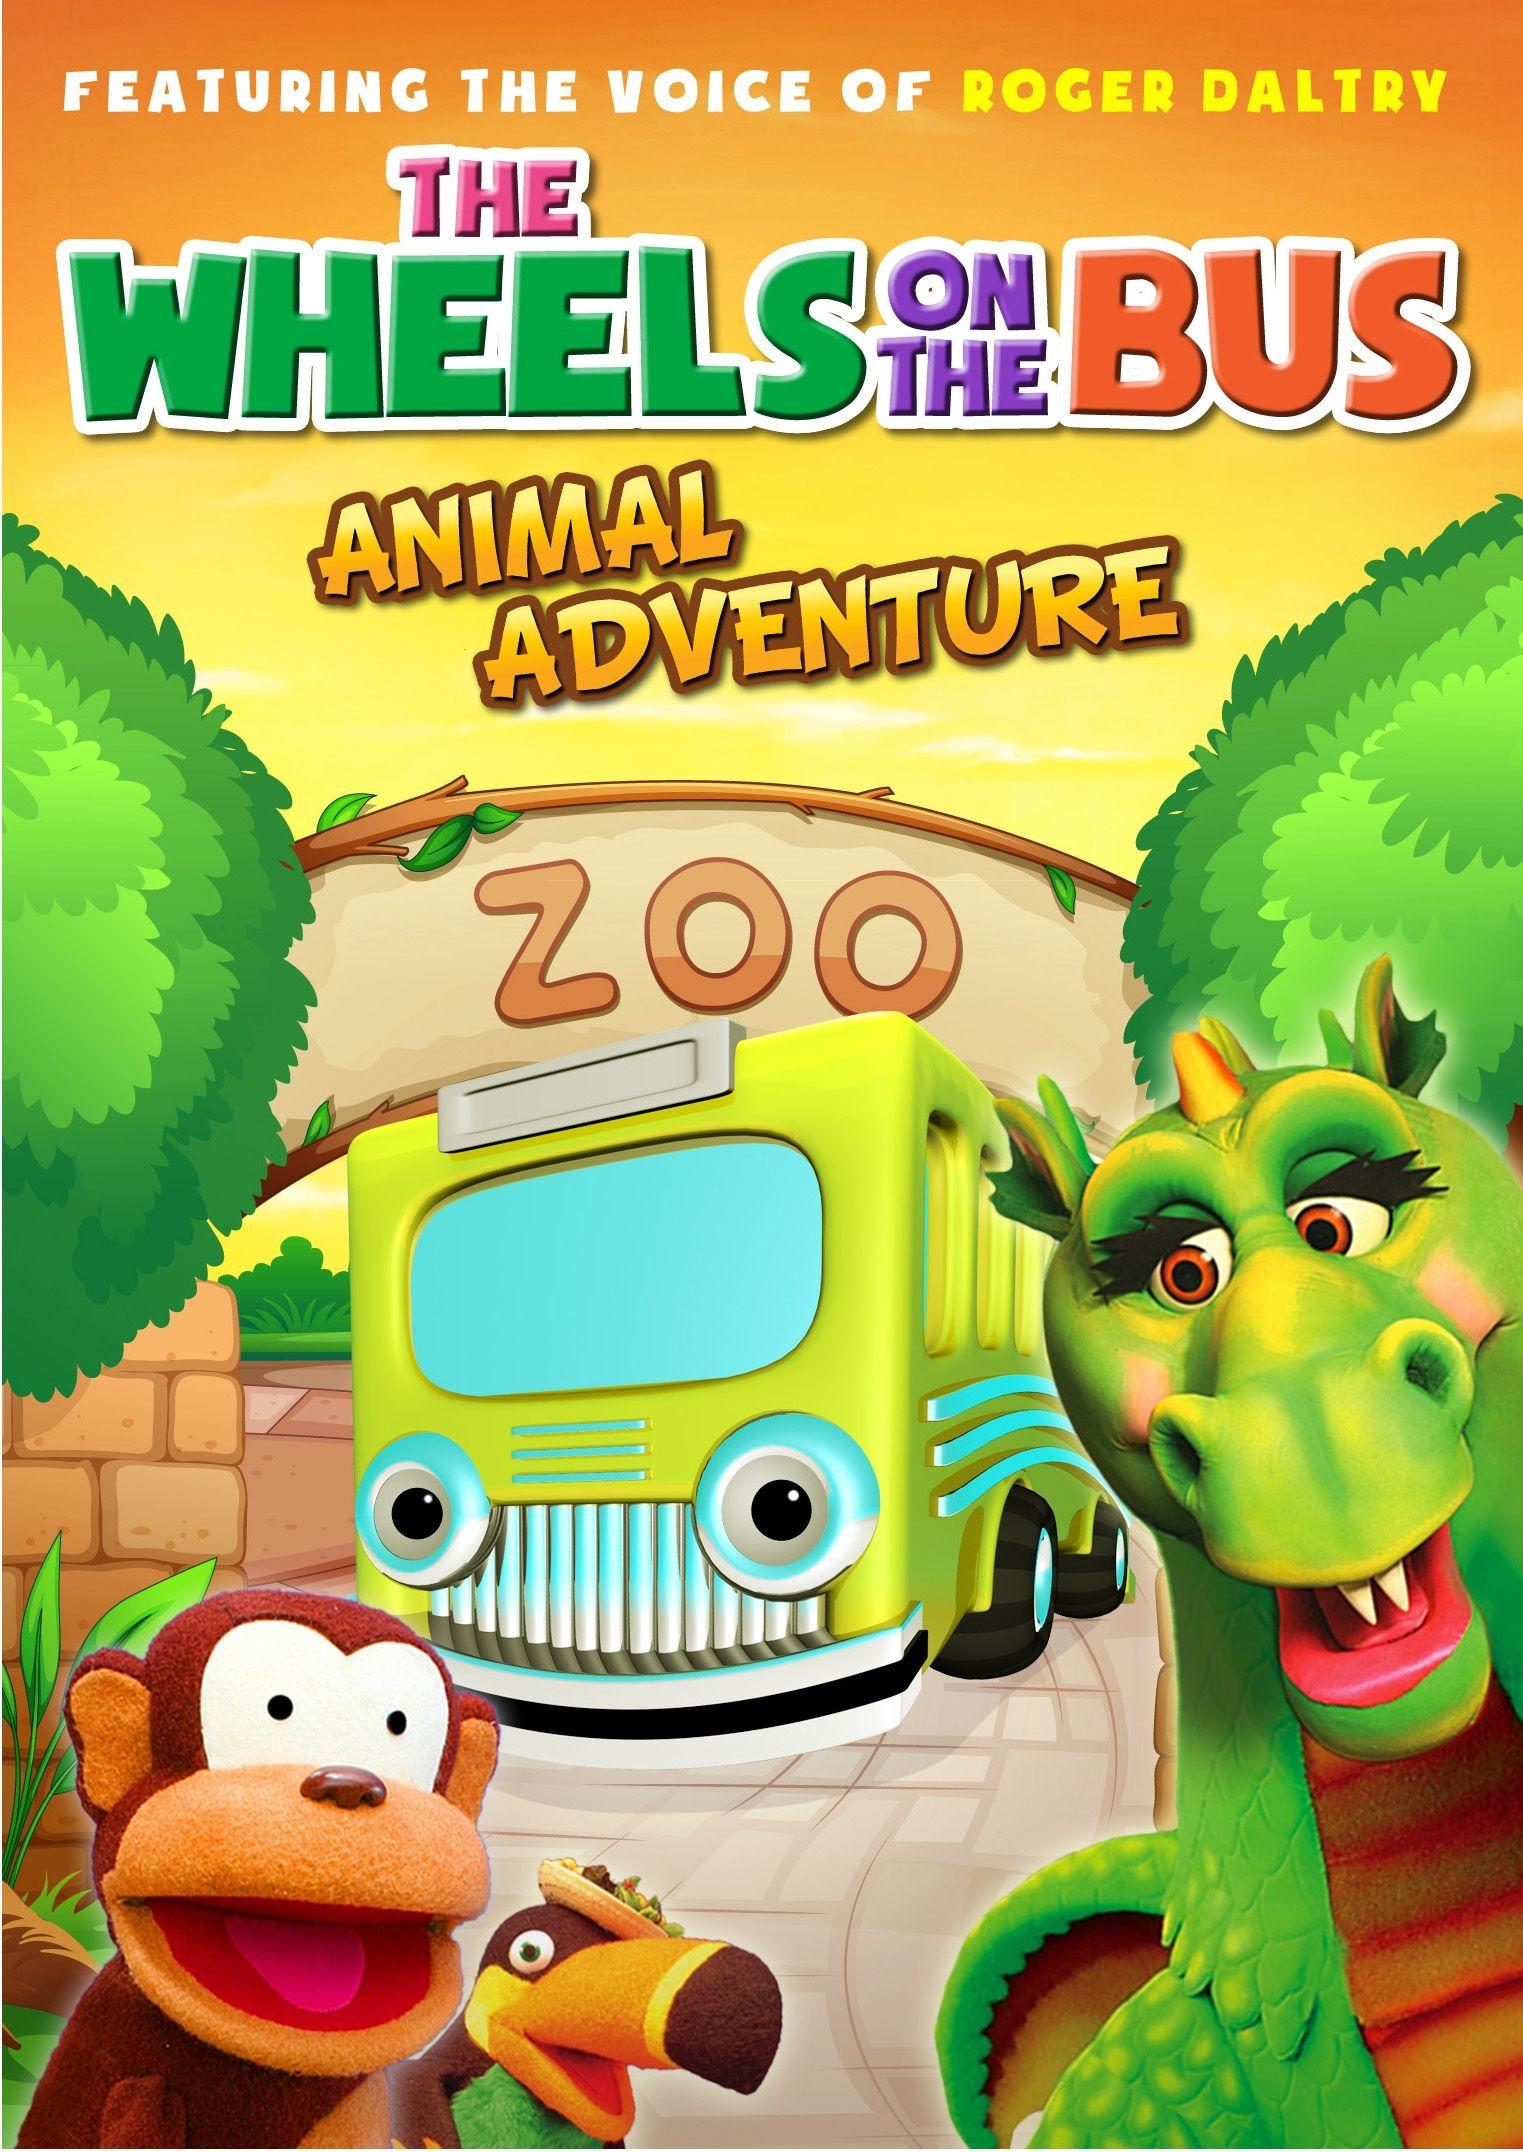 The Wheels on the Bus: Animal Adventure